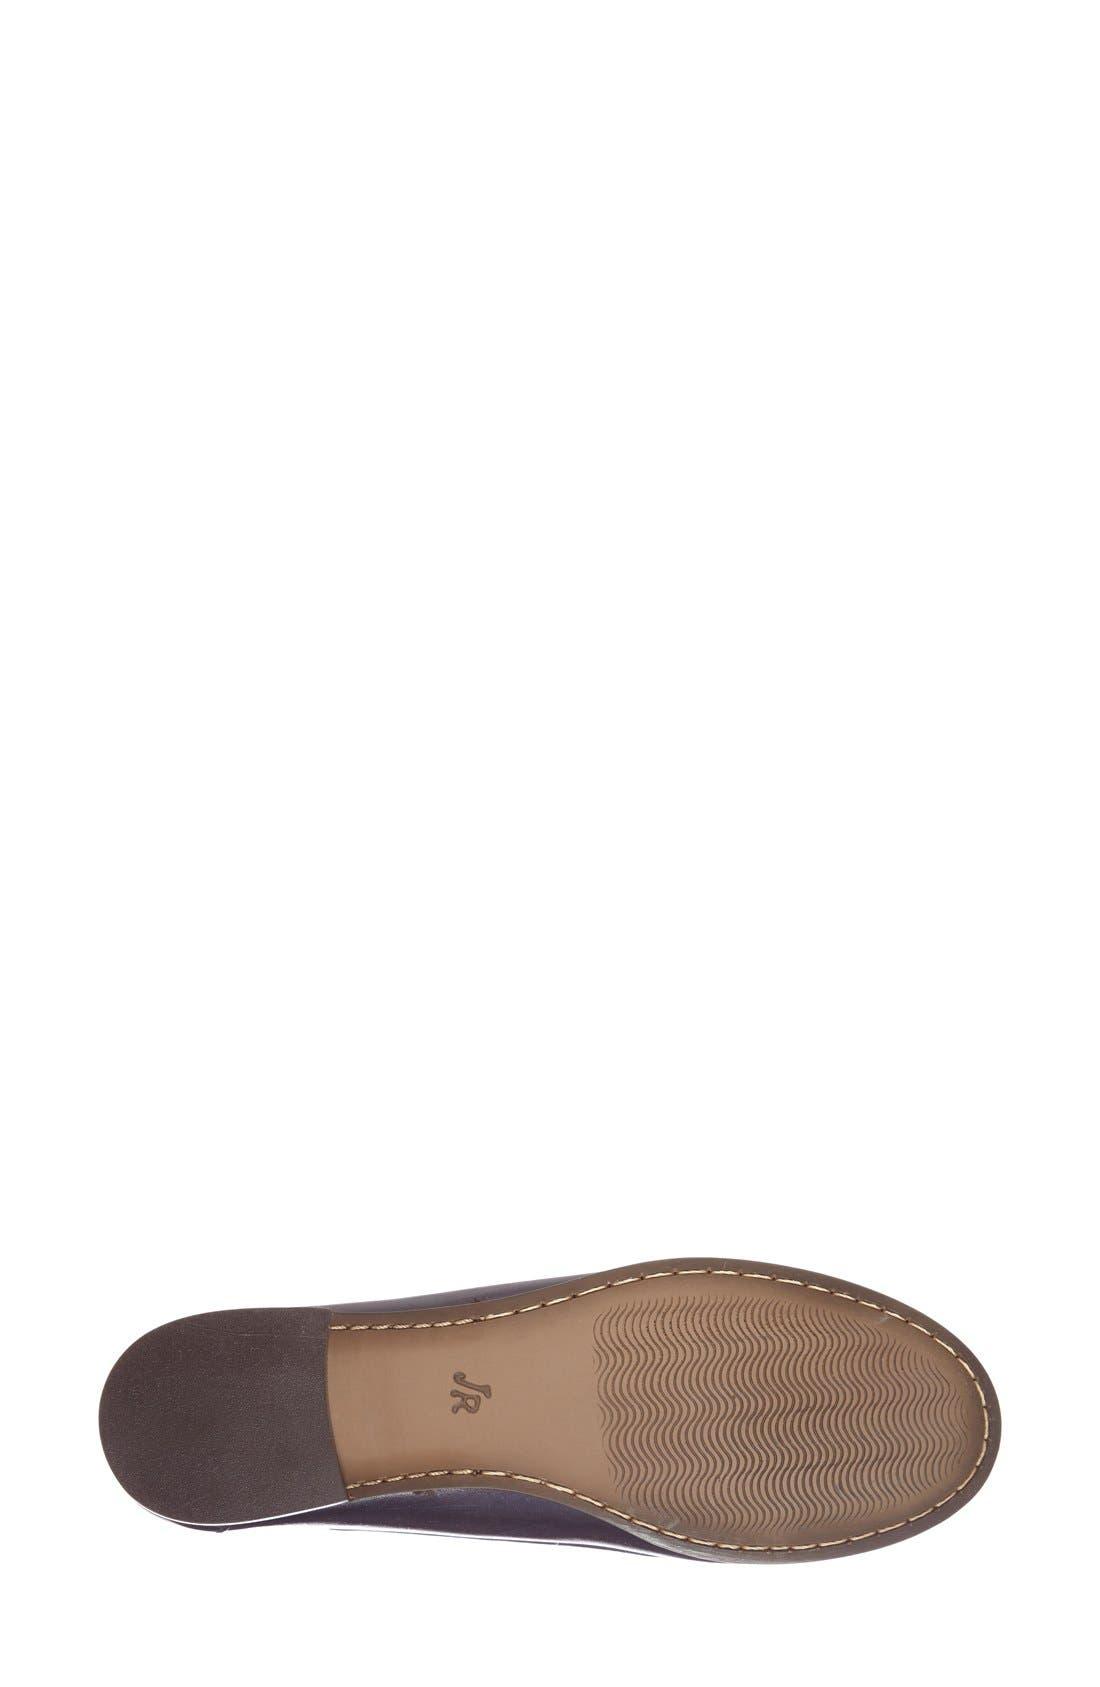 'Quinn' Leather Loafer,                             Alternate thumbnail 11, color,